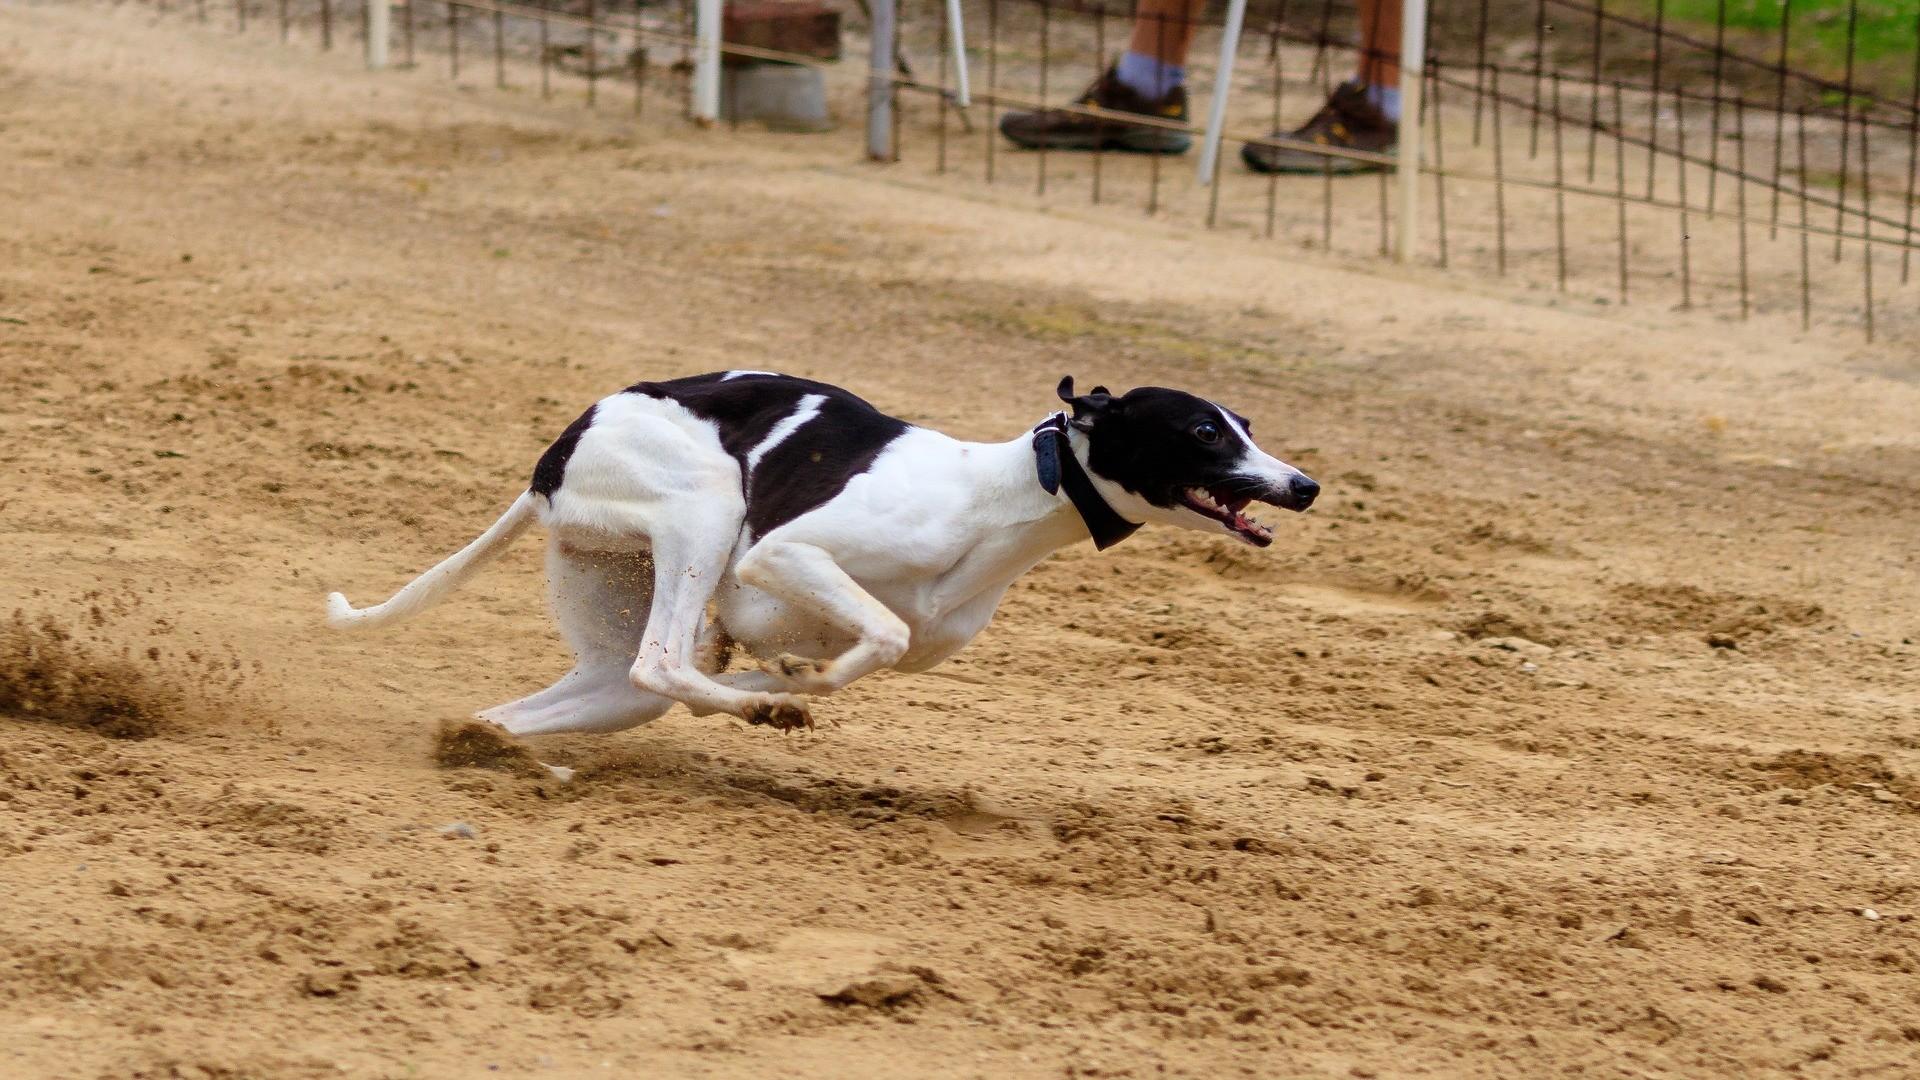 Poole Greyhound Racing dog